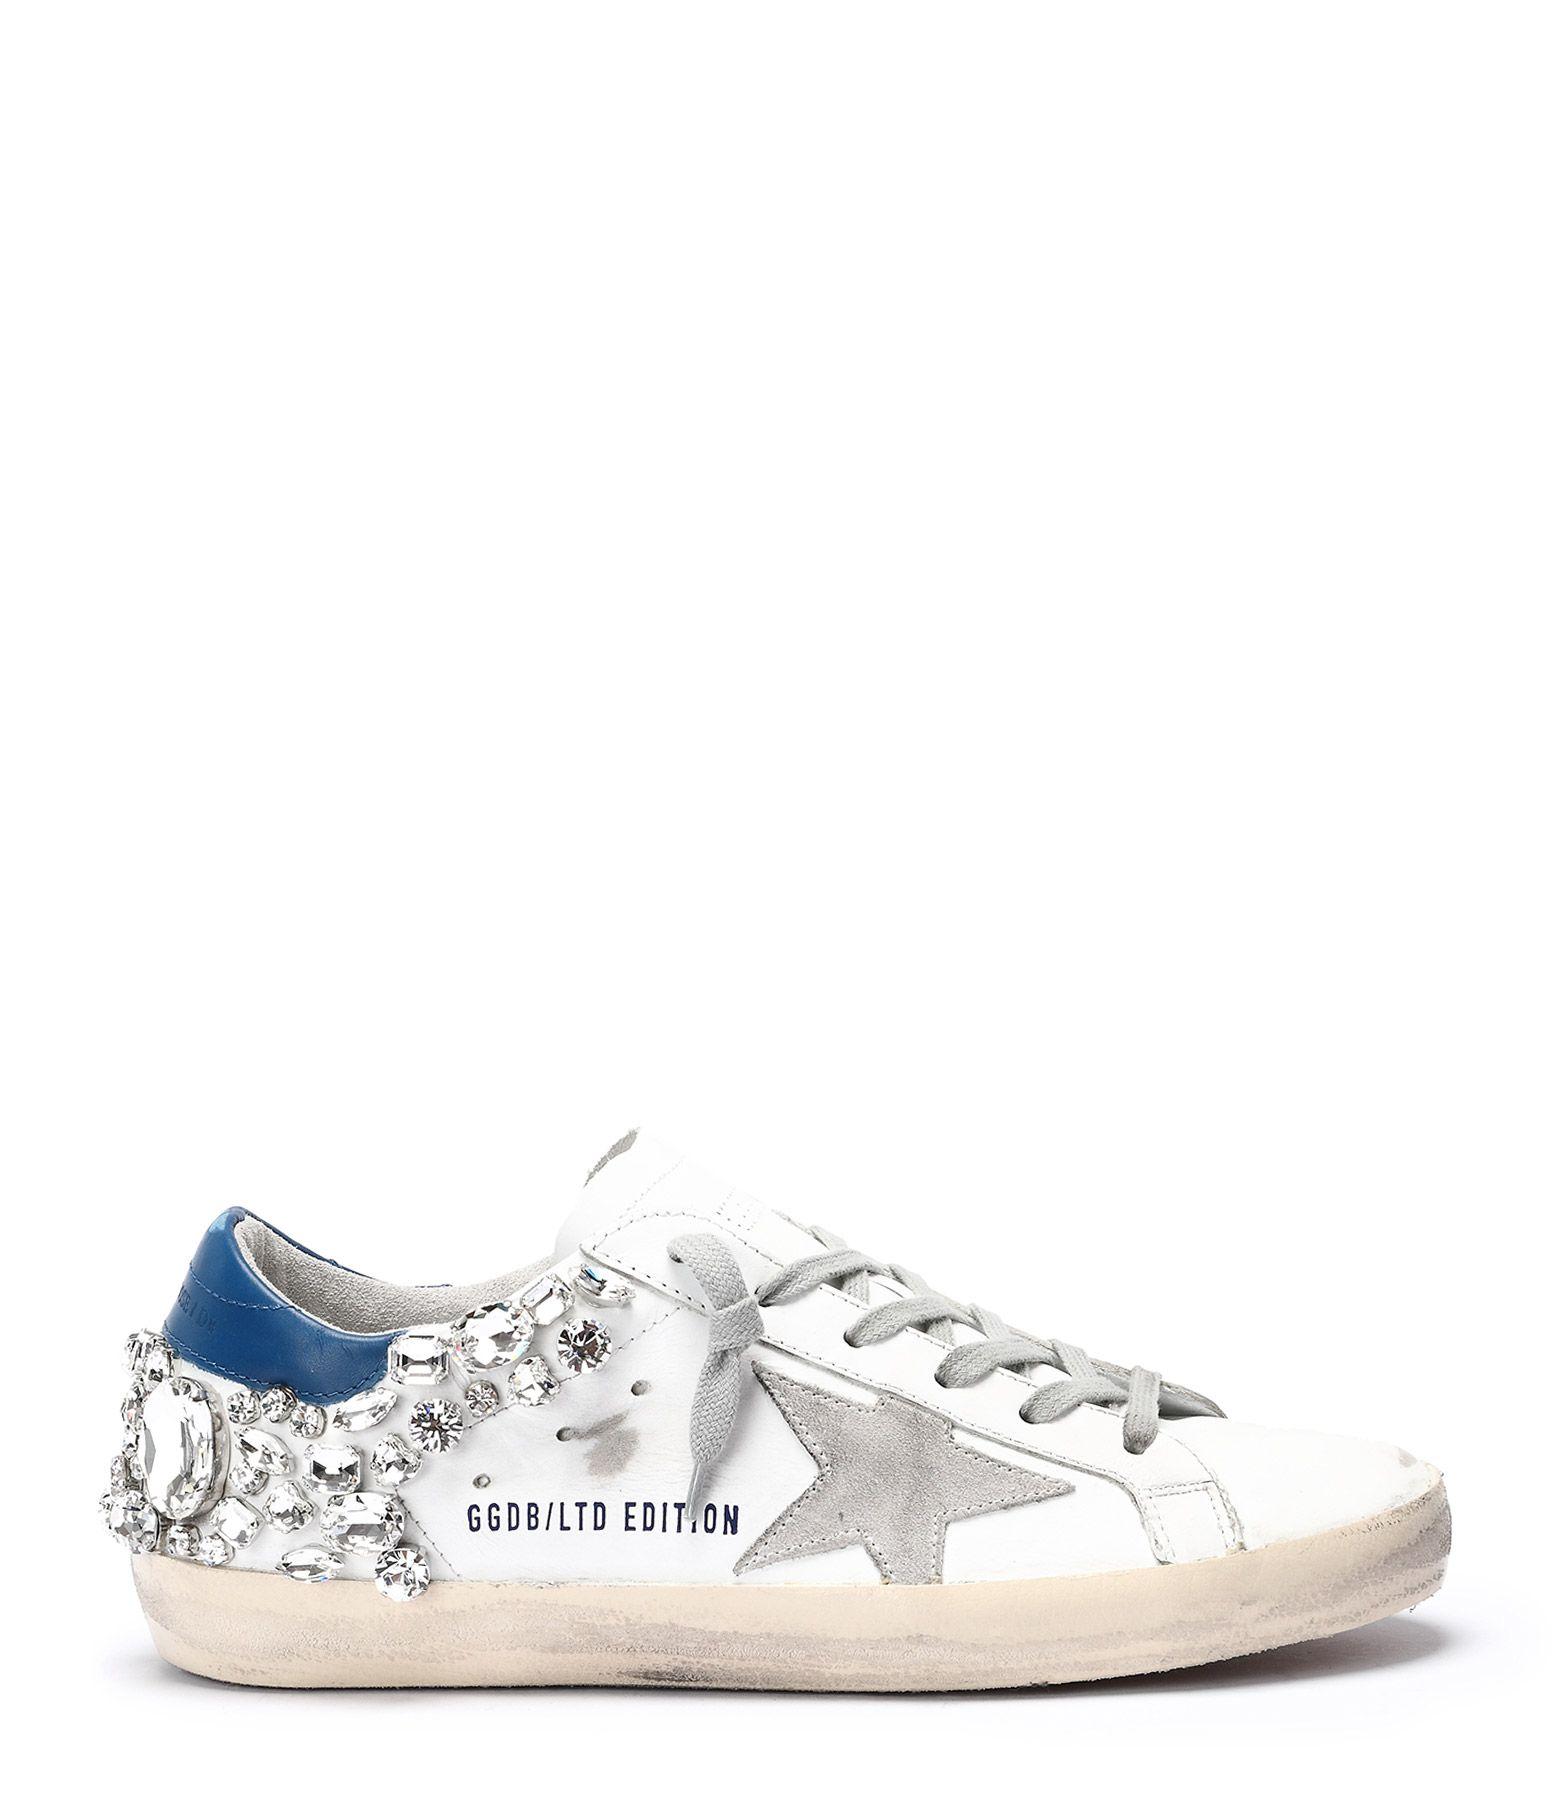 GOLDEN GOOSE Baskets Superstar Diamants Blanc Bleu Edition